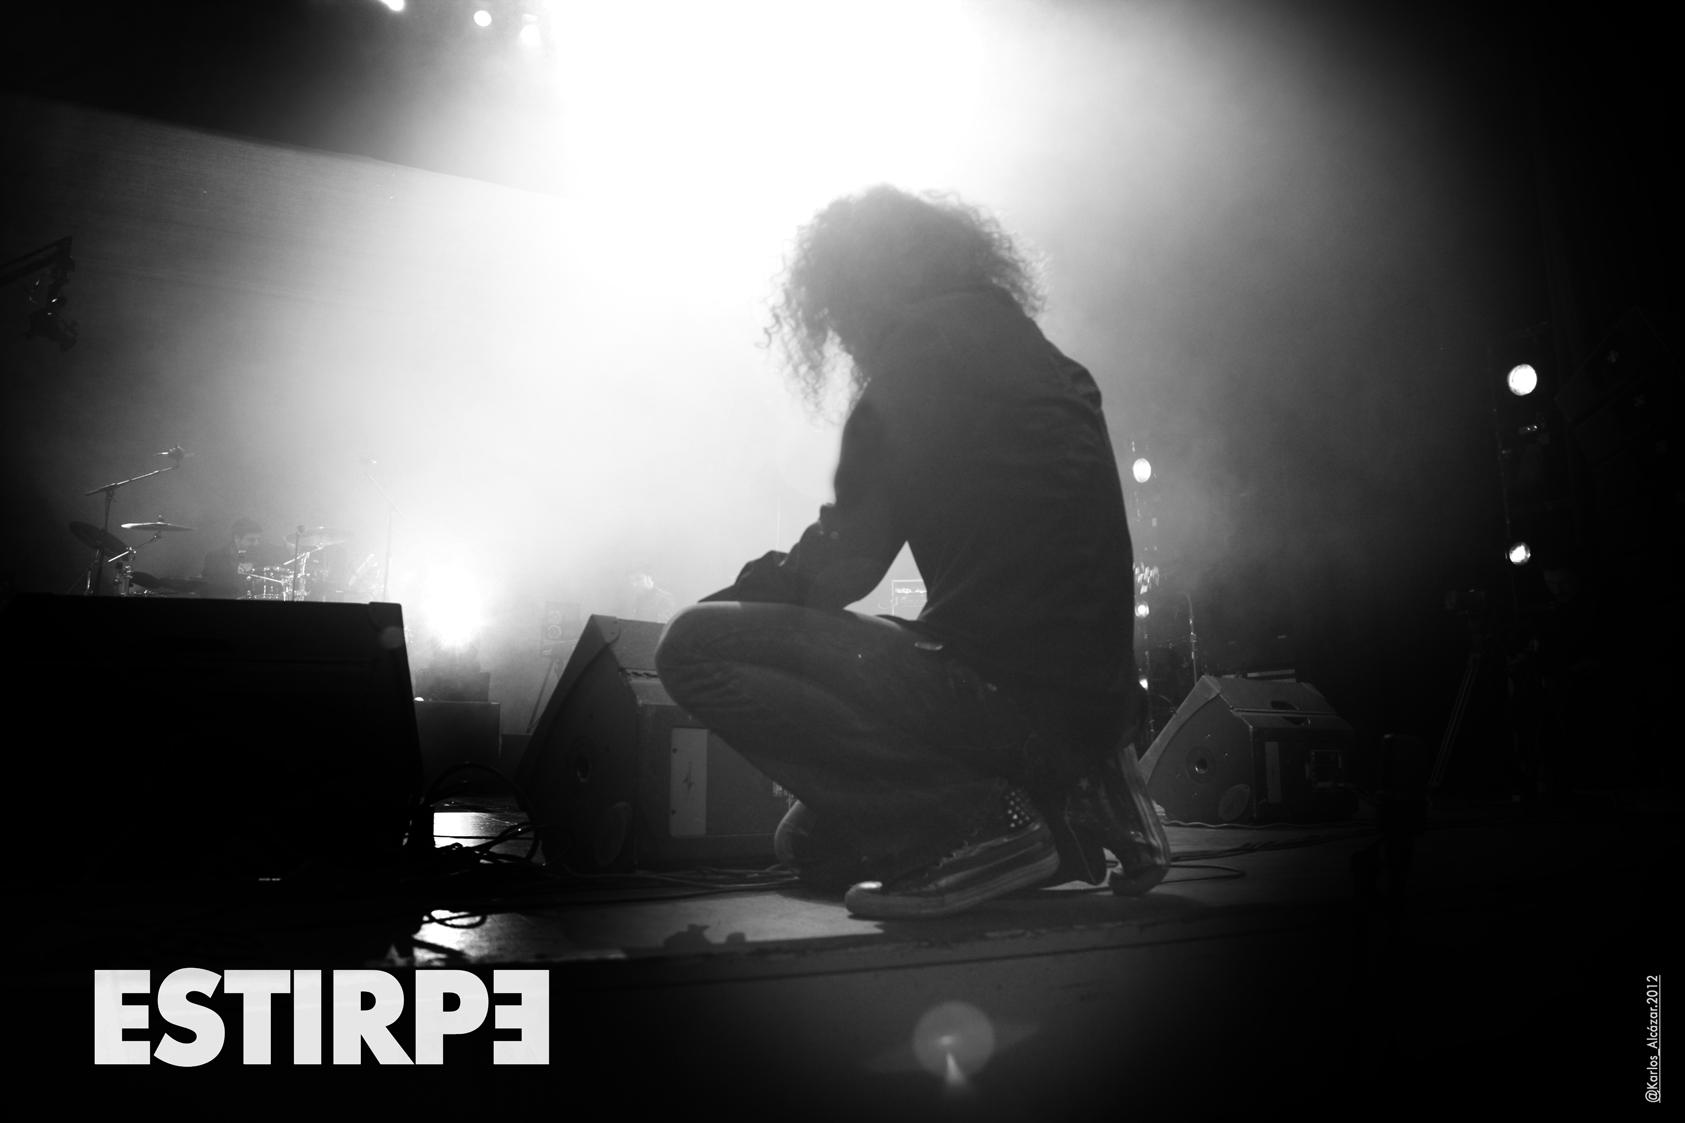 ESTIRPE-PIC-02-web